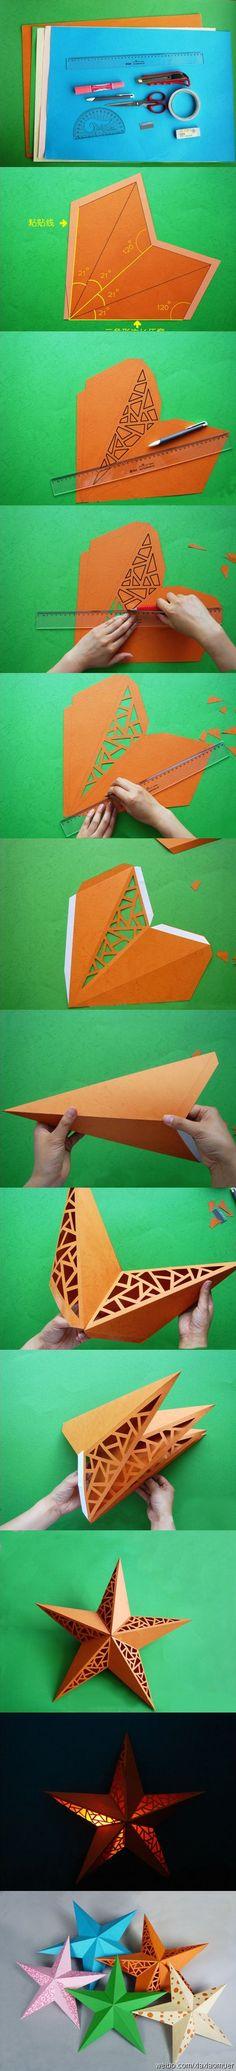 Lámpara de estrella de papel